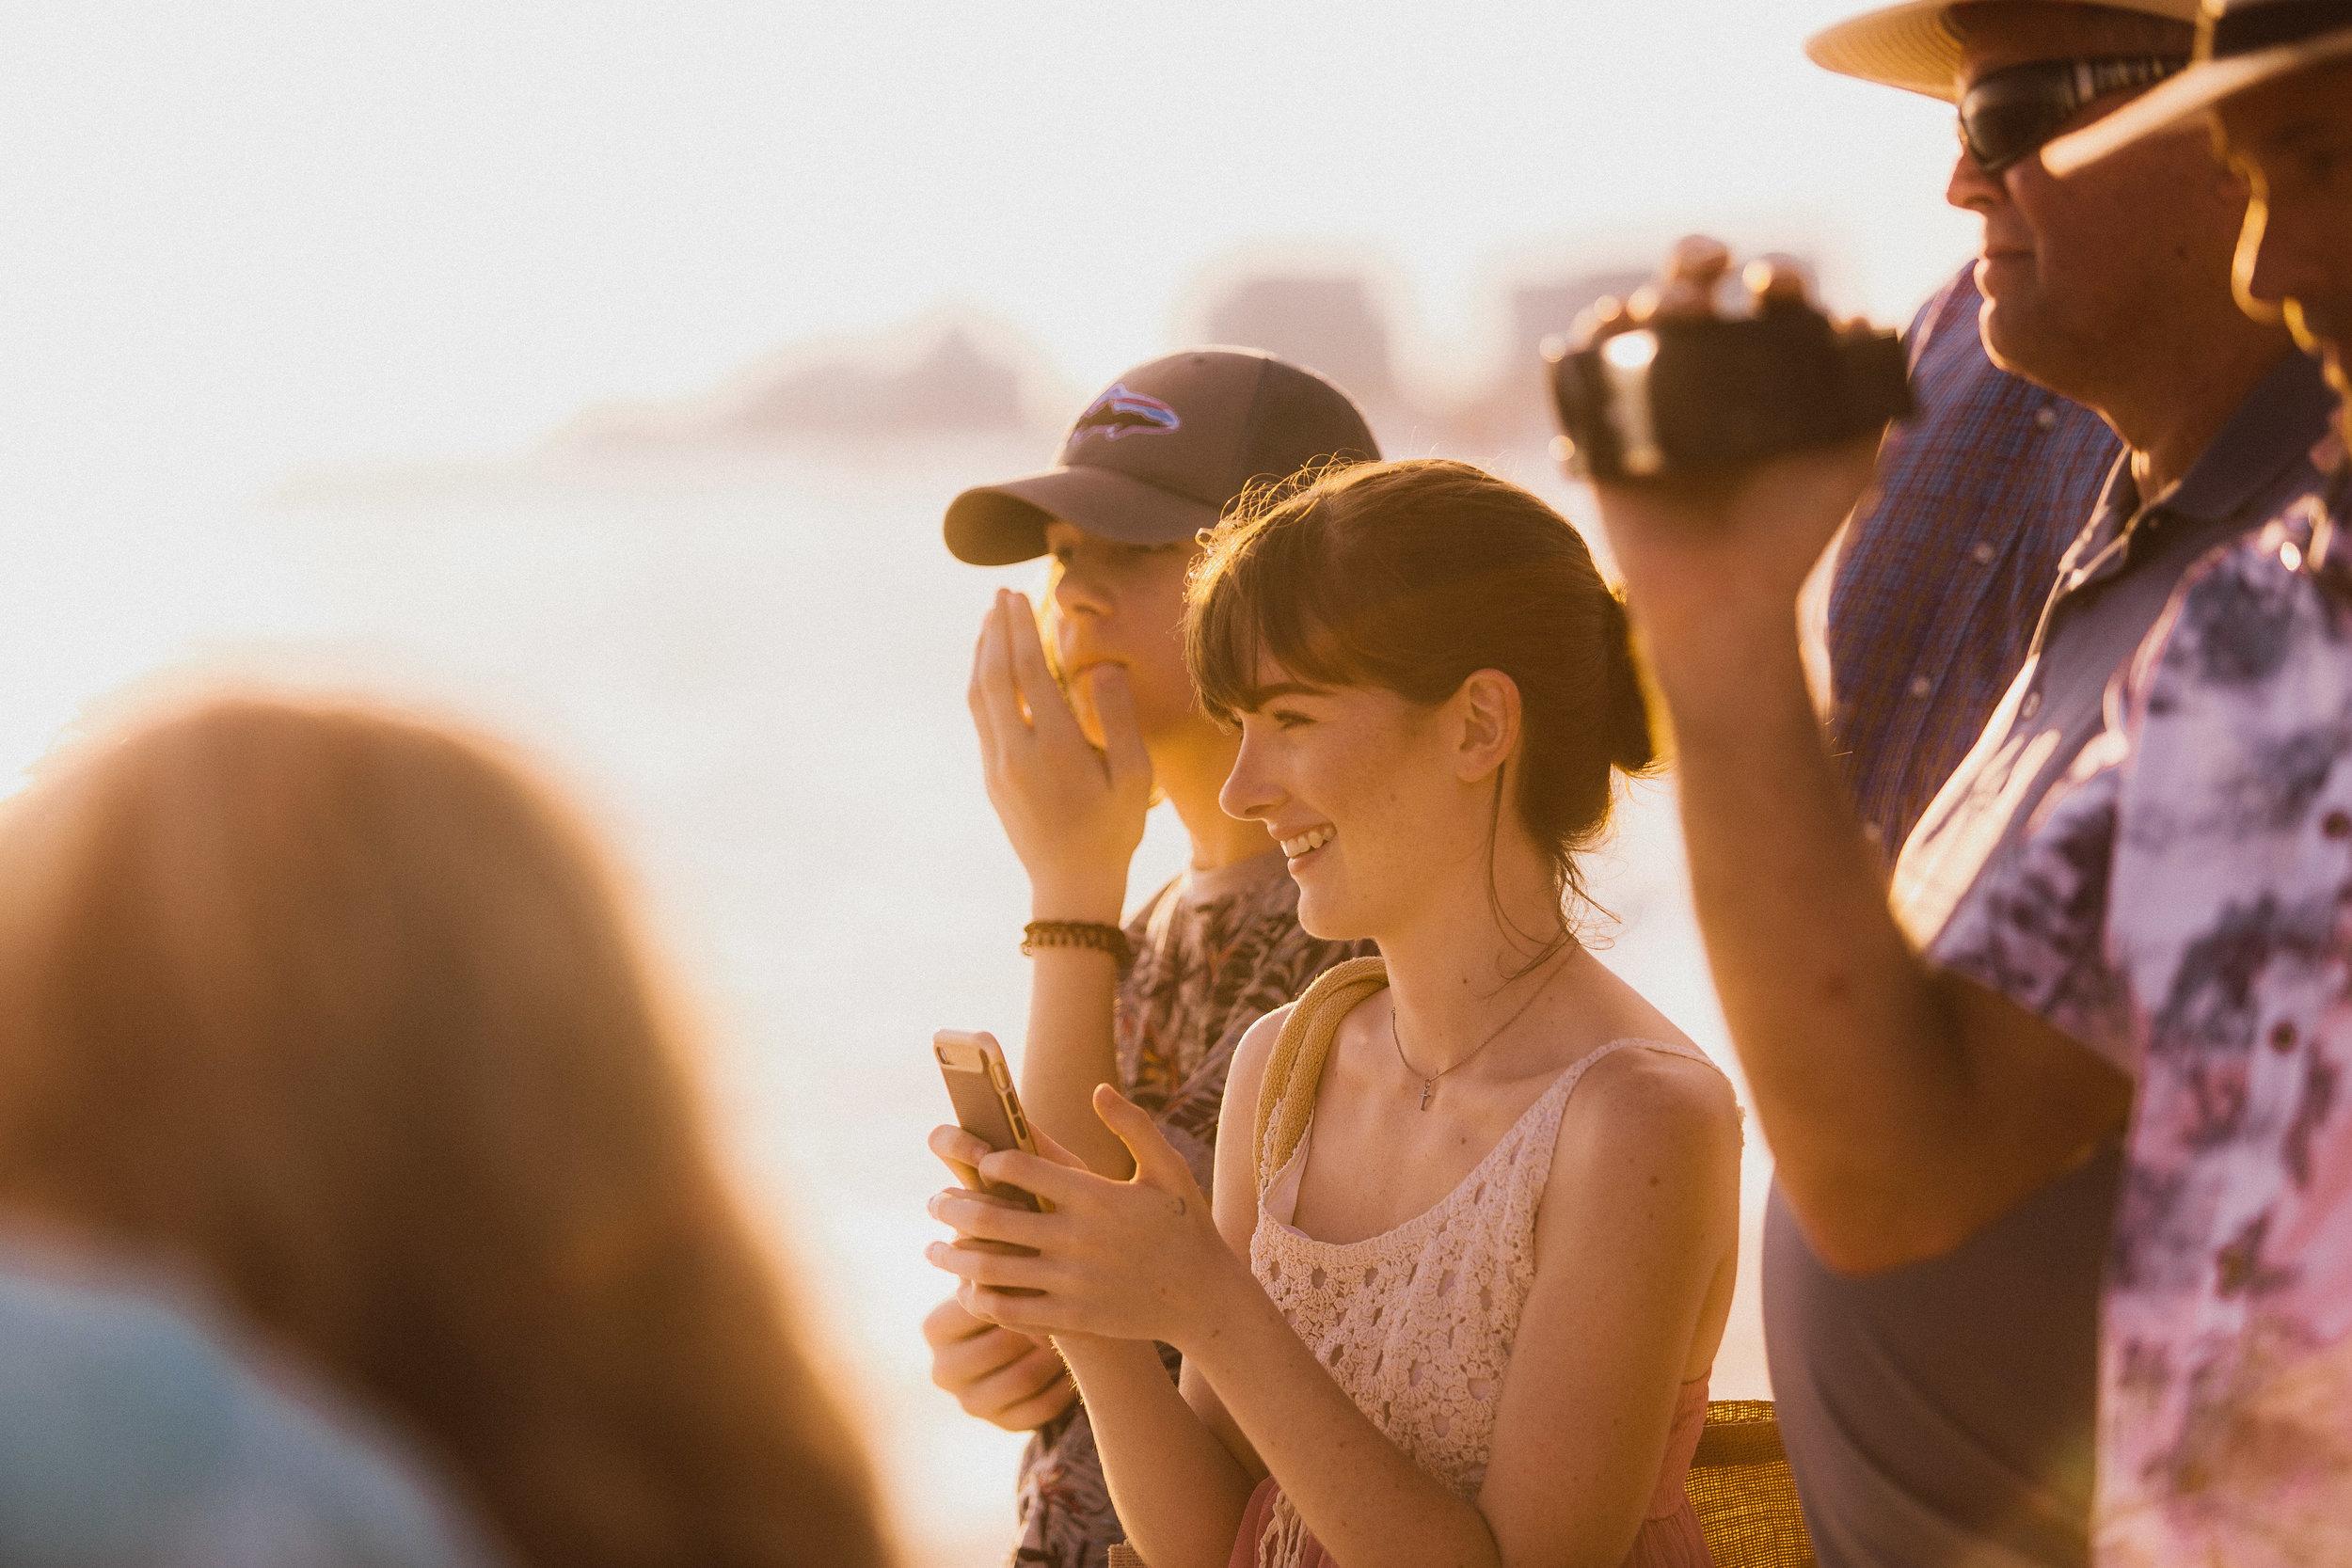 destin_sunset_beach_elopement_intimate_wedding_photographer_florida_documentary_1183.jpg